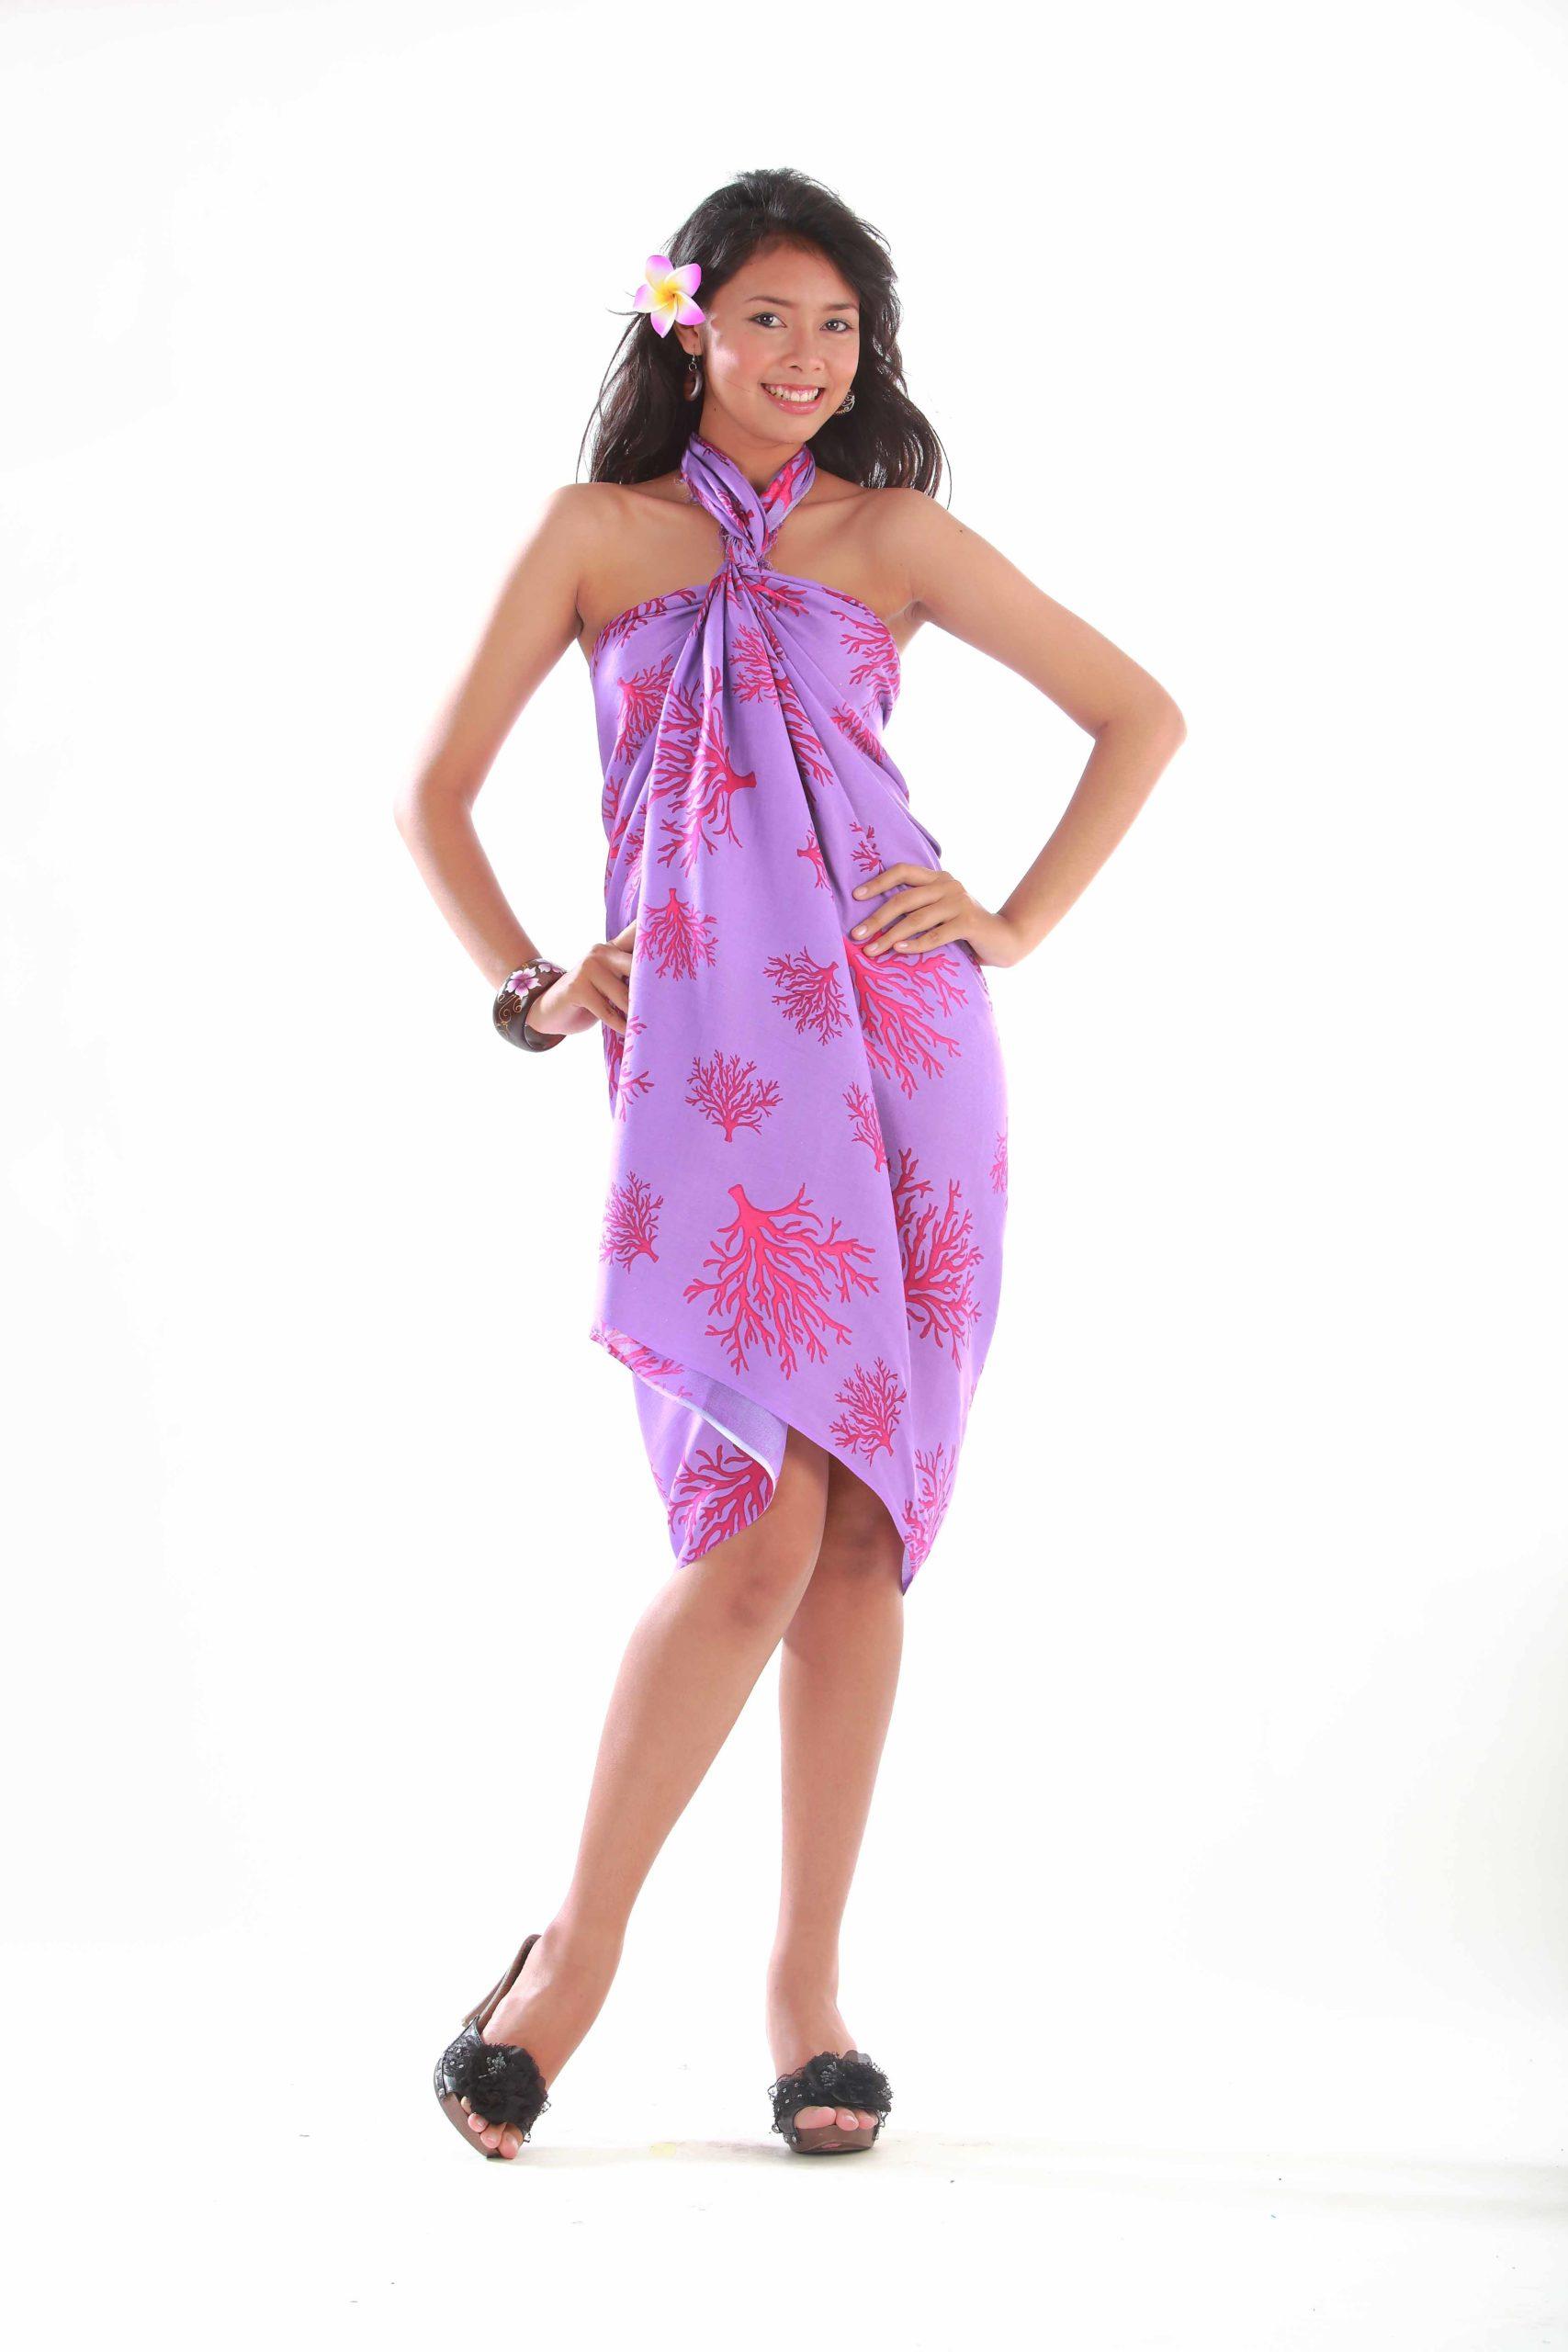 Fashion - One World Sarongs 08